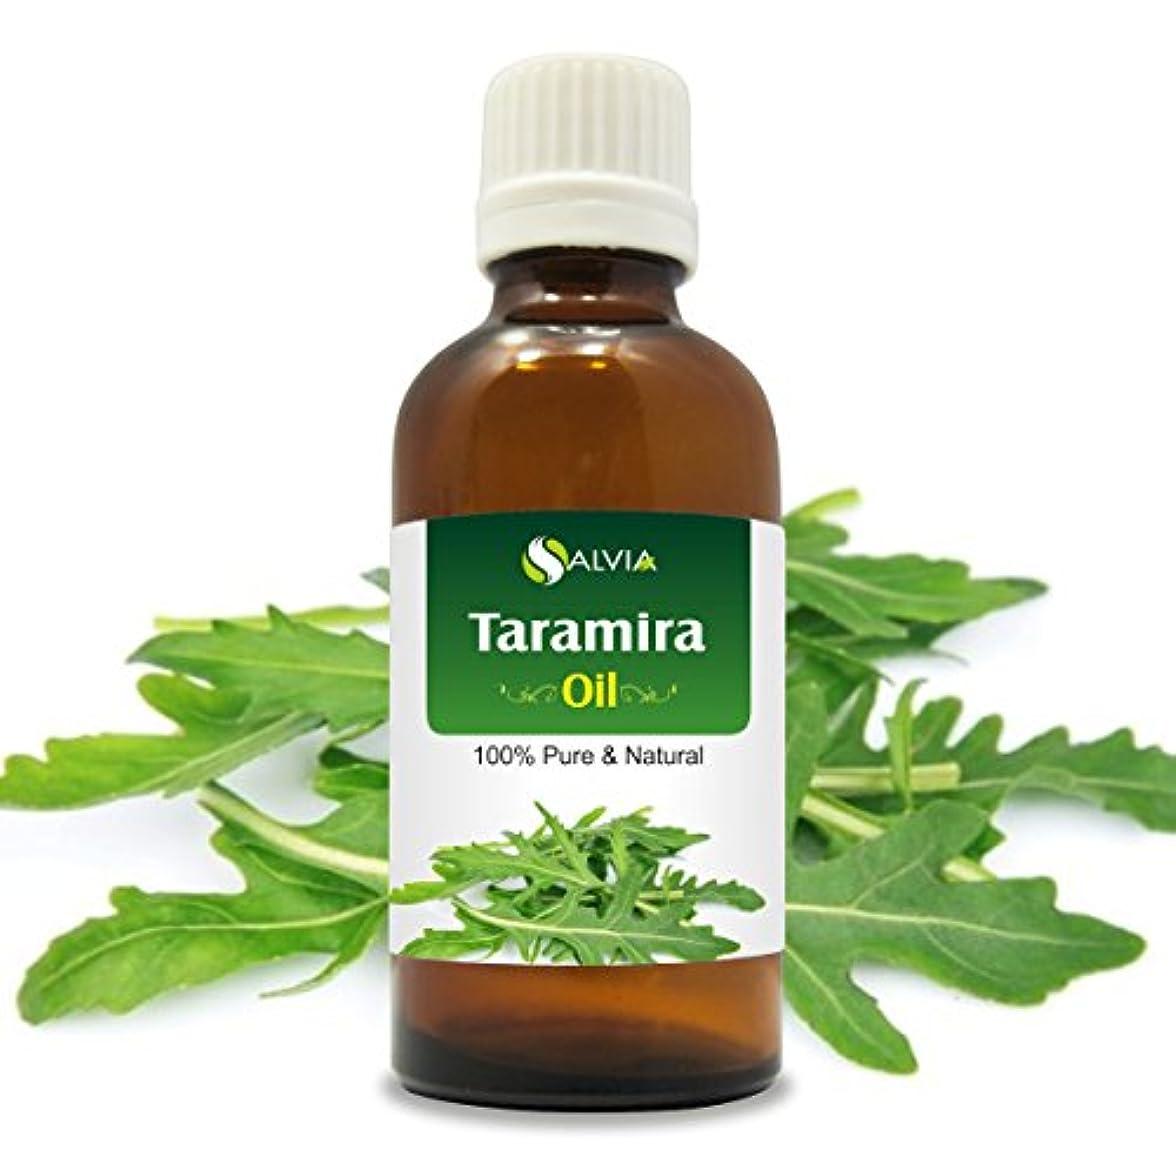 TARAMIRA OIL 100% NATURAL PURE UNDILUTED UNCUT ESSENTIAL OIL 50ML